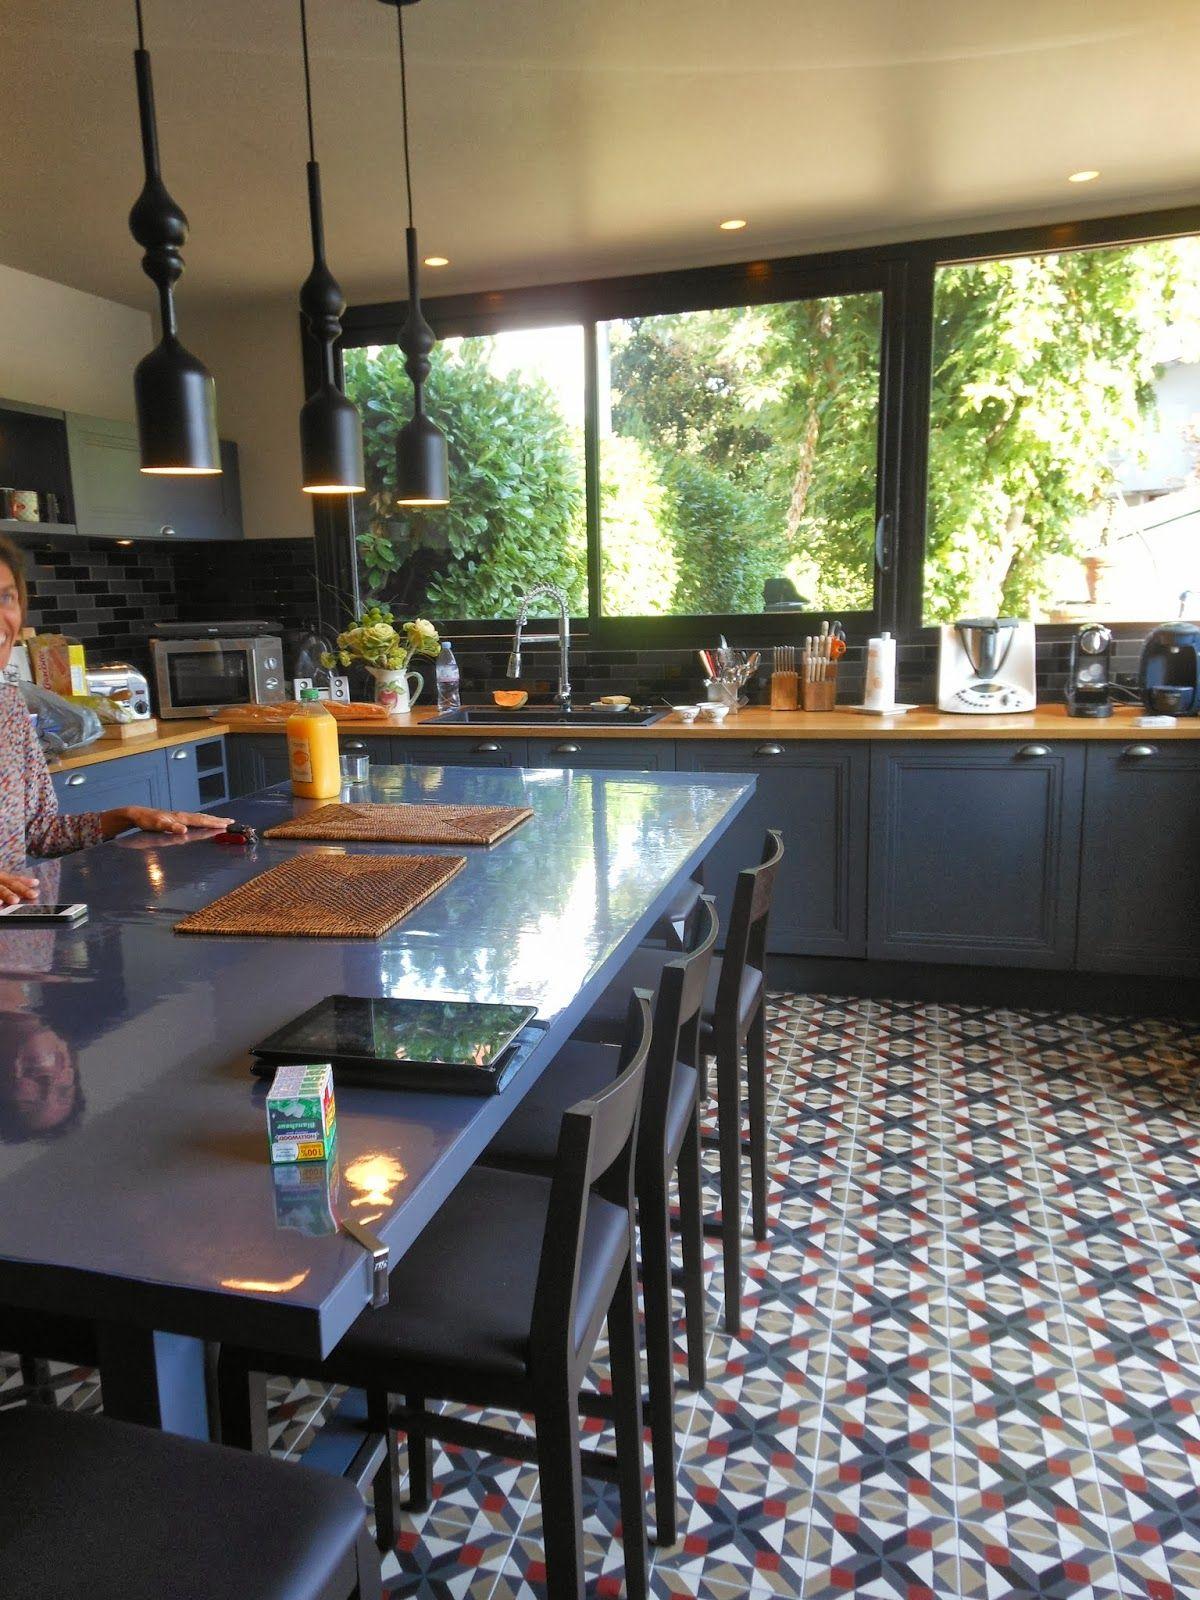 Gris bleu anthracite | Cuisine moderne, Carrelage cuisine et Veranda cuisine